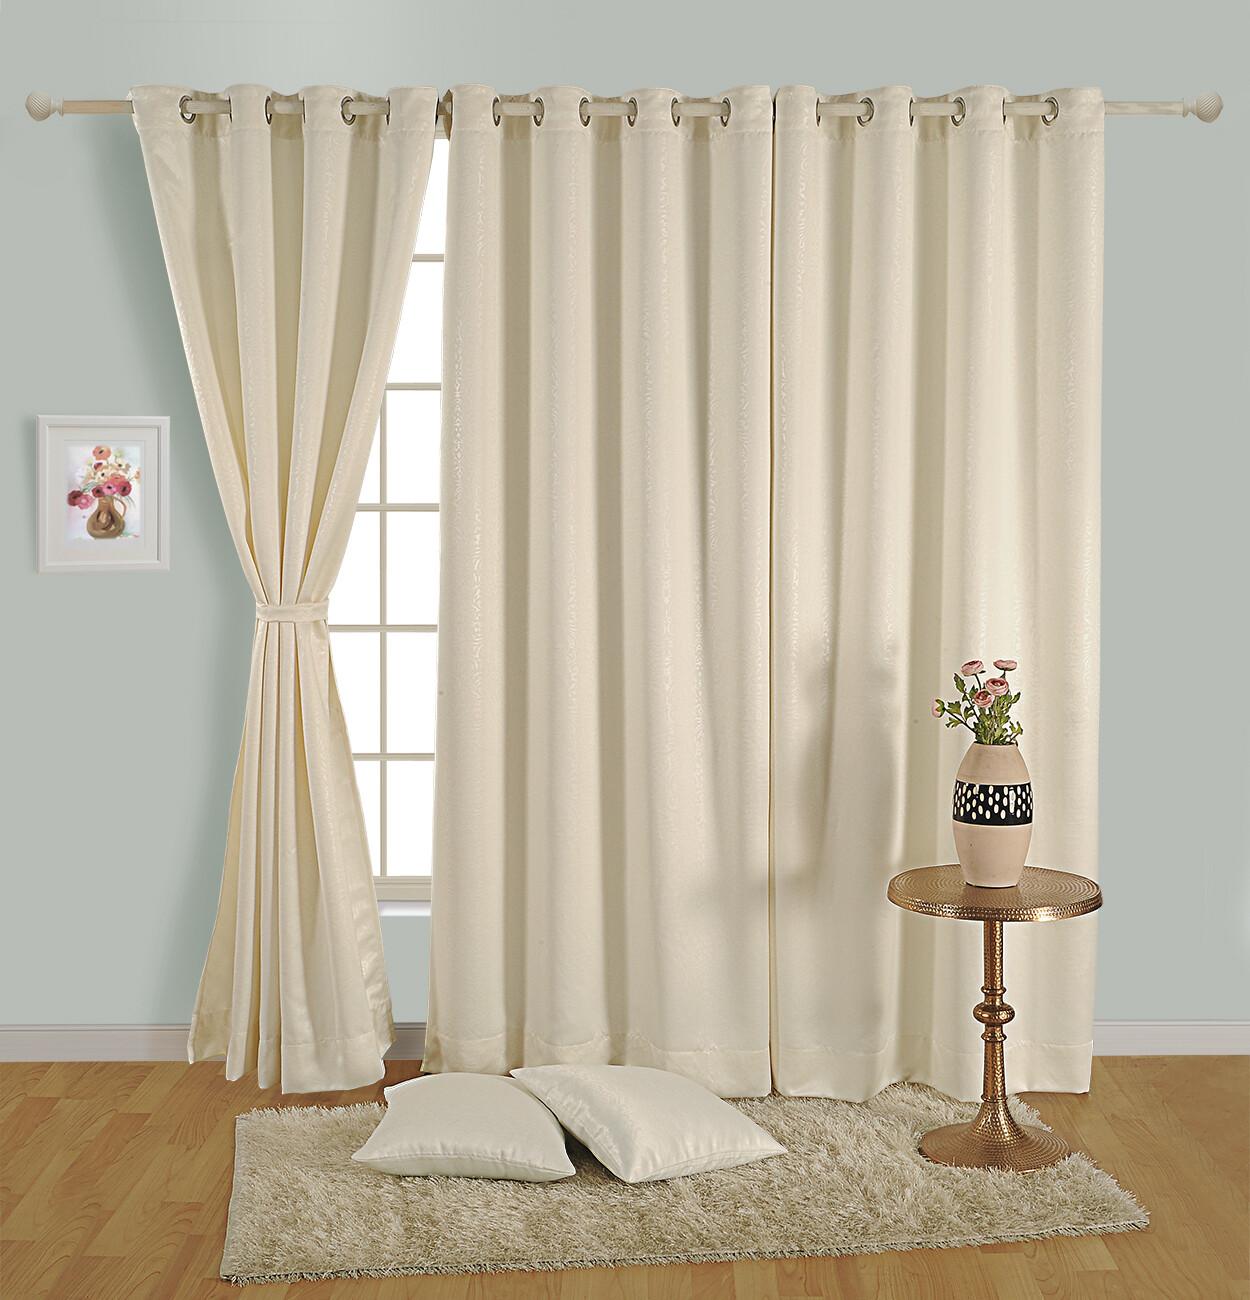 Swayam Off White Colour Paisley J&B Blackout Eyelet Curtain for Window